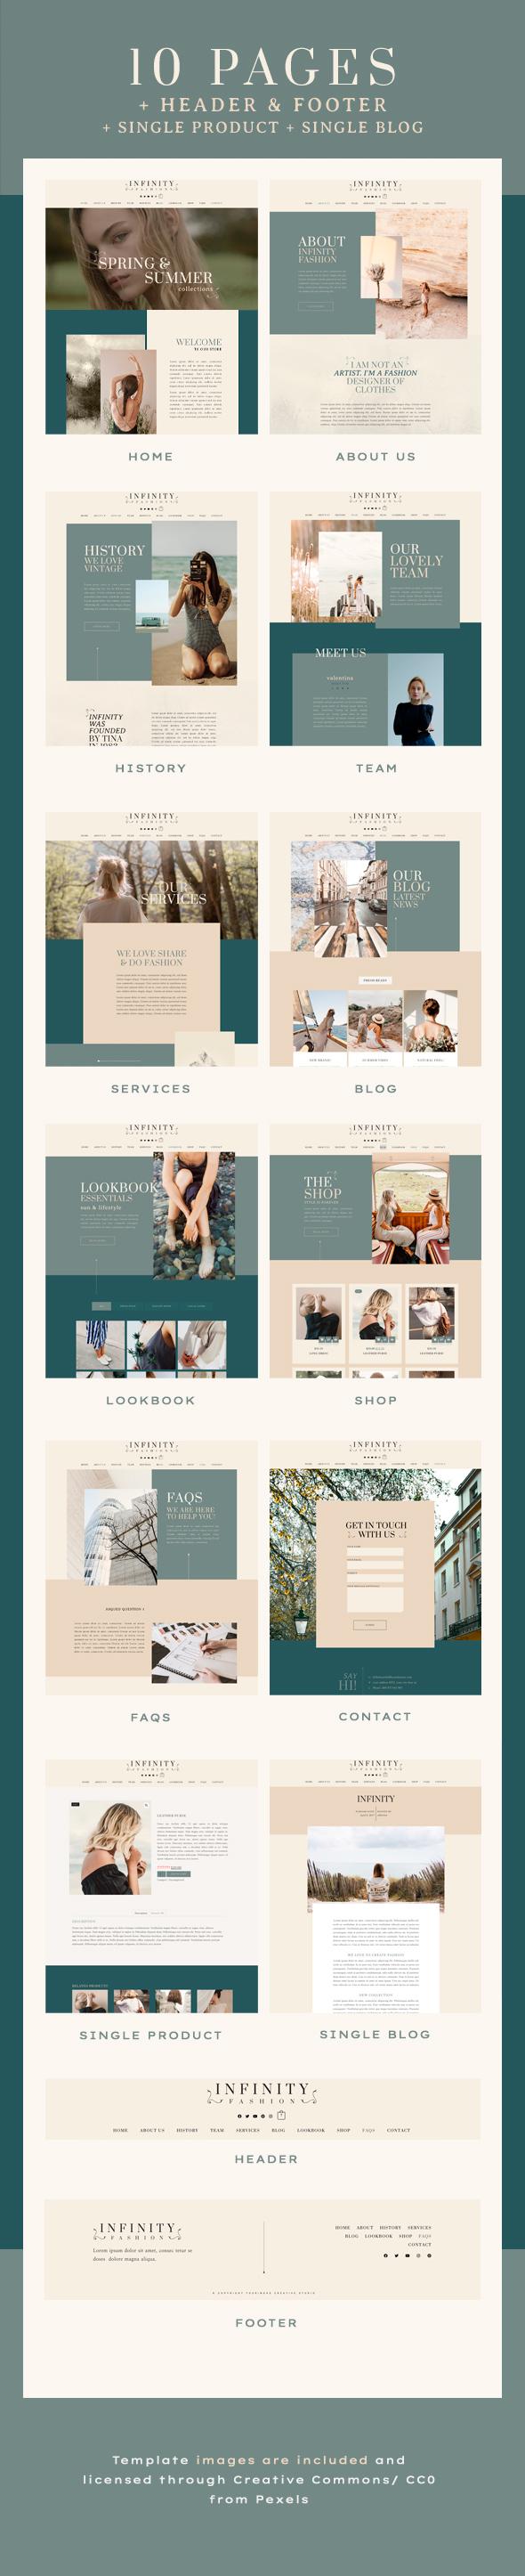 Infinity Fashion | Elementor Template Kit - WordPress